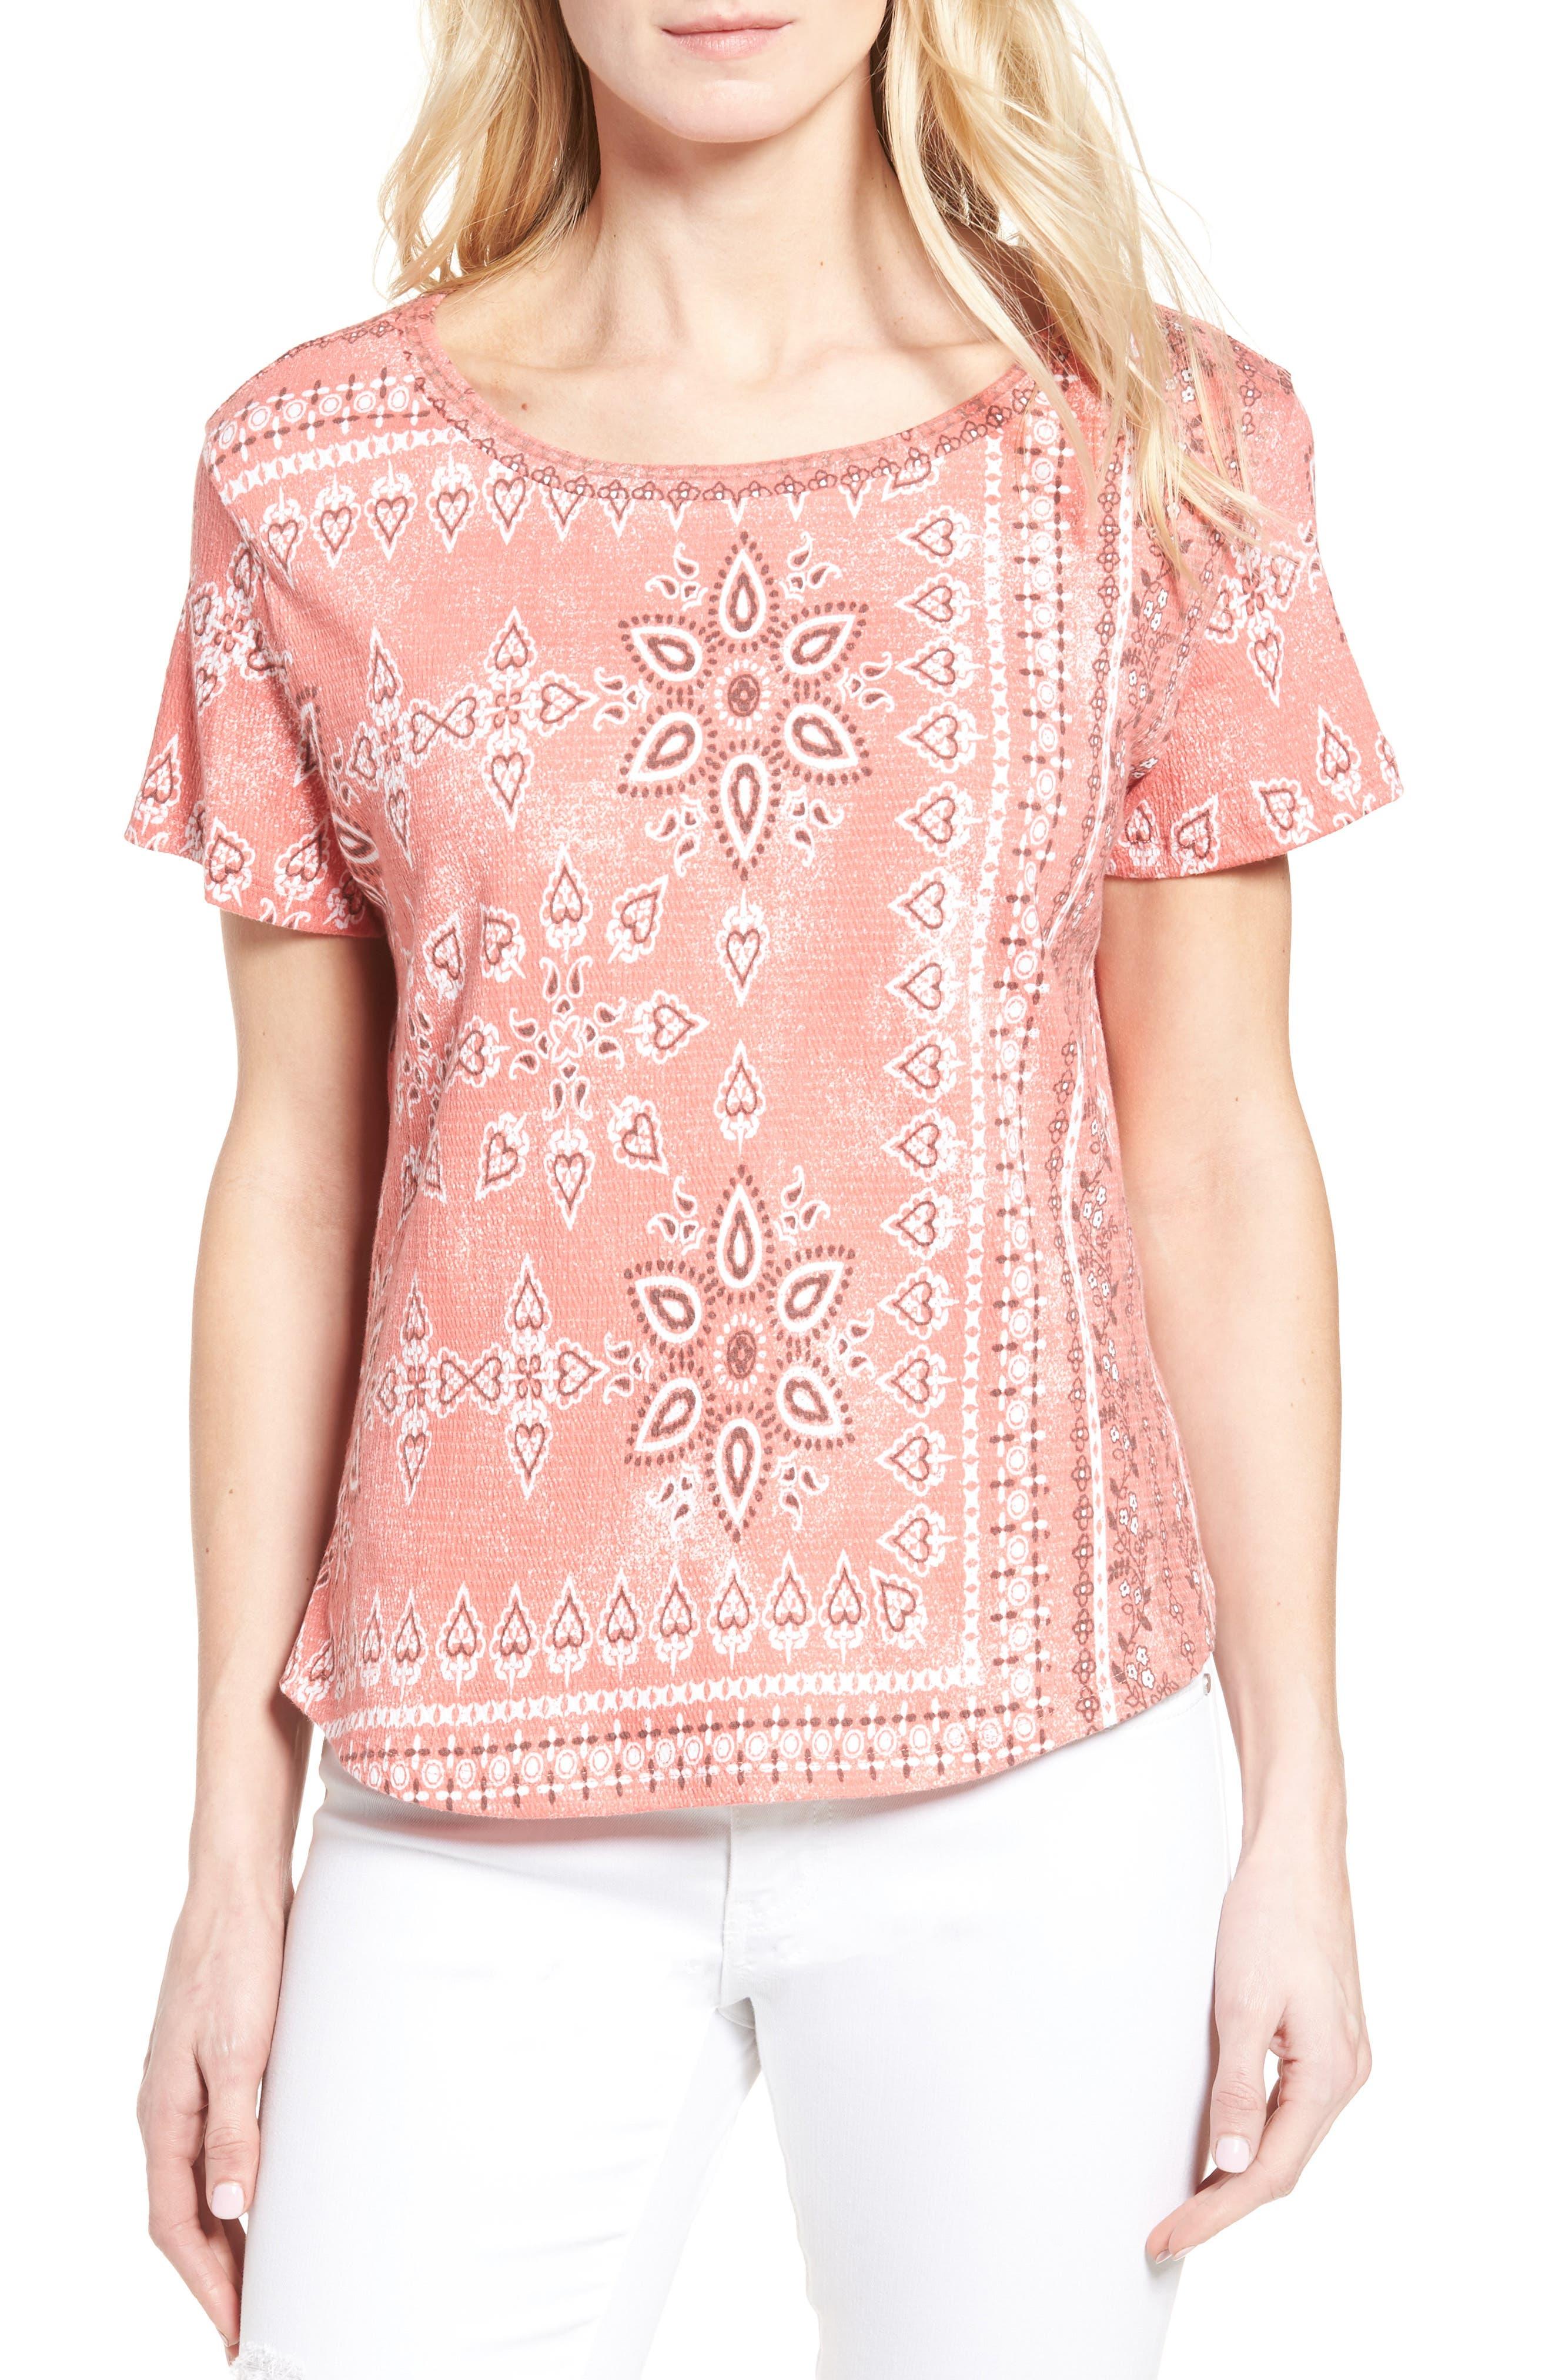 Alternate Image 1 Selected - Caslon® Print Crinkle Cotton Blend Top (Regular & Petite)